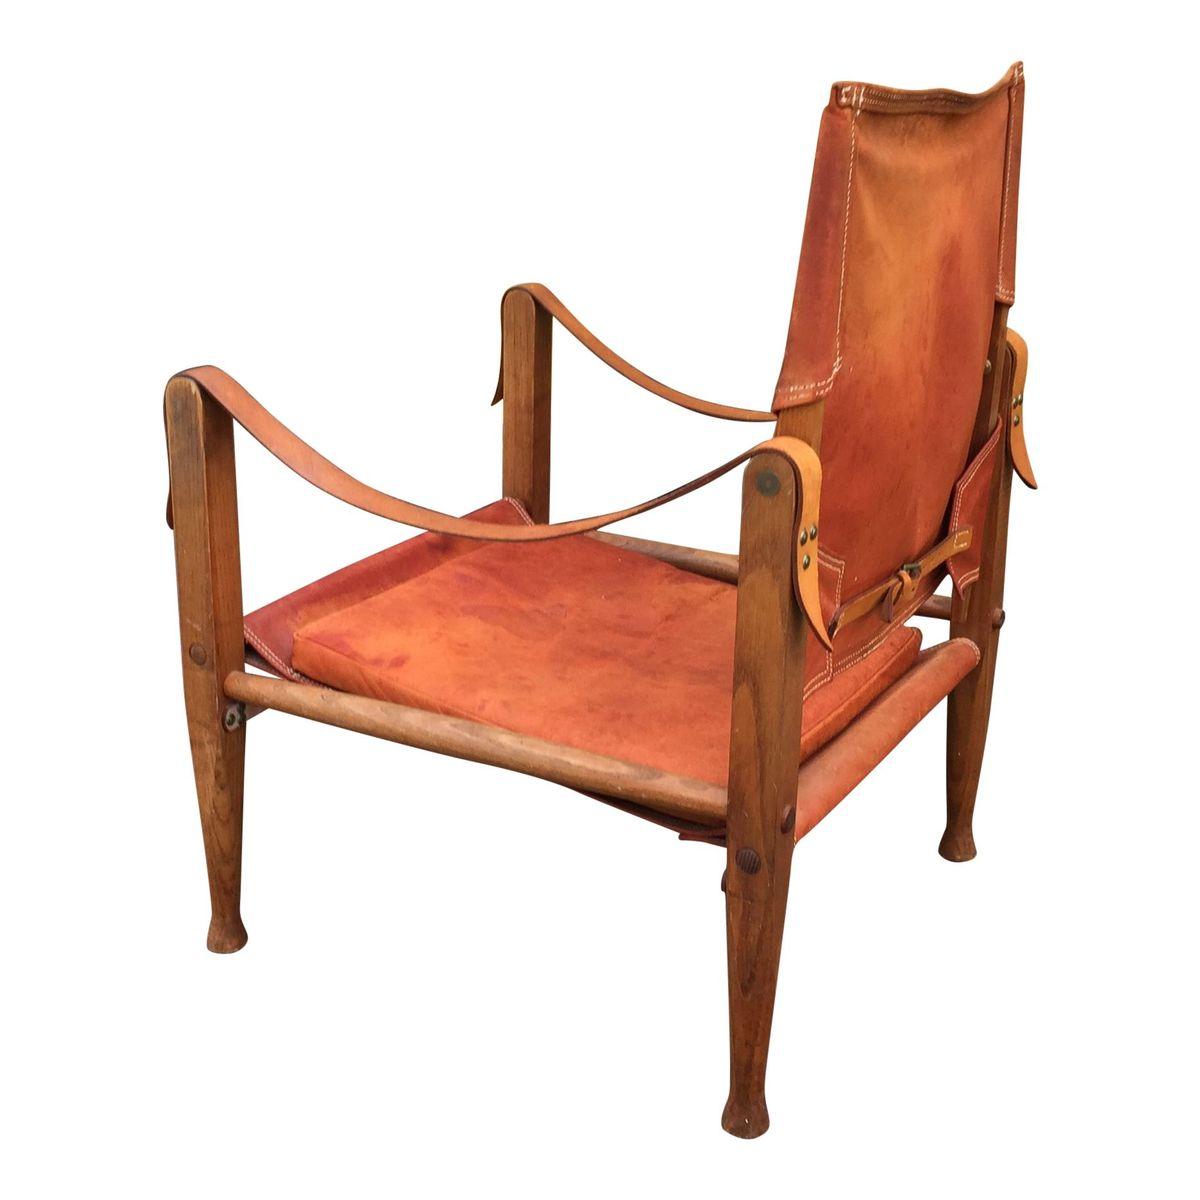 leather safari chair folding jakarta by kaare klint for rud rasmussen